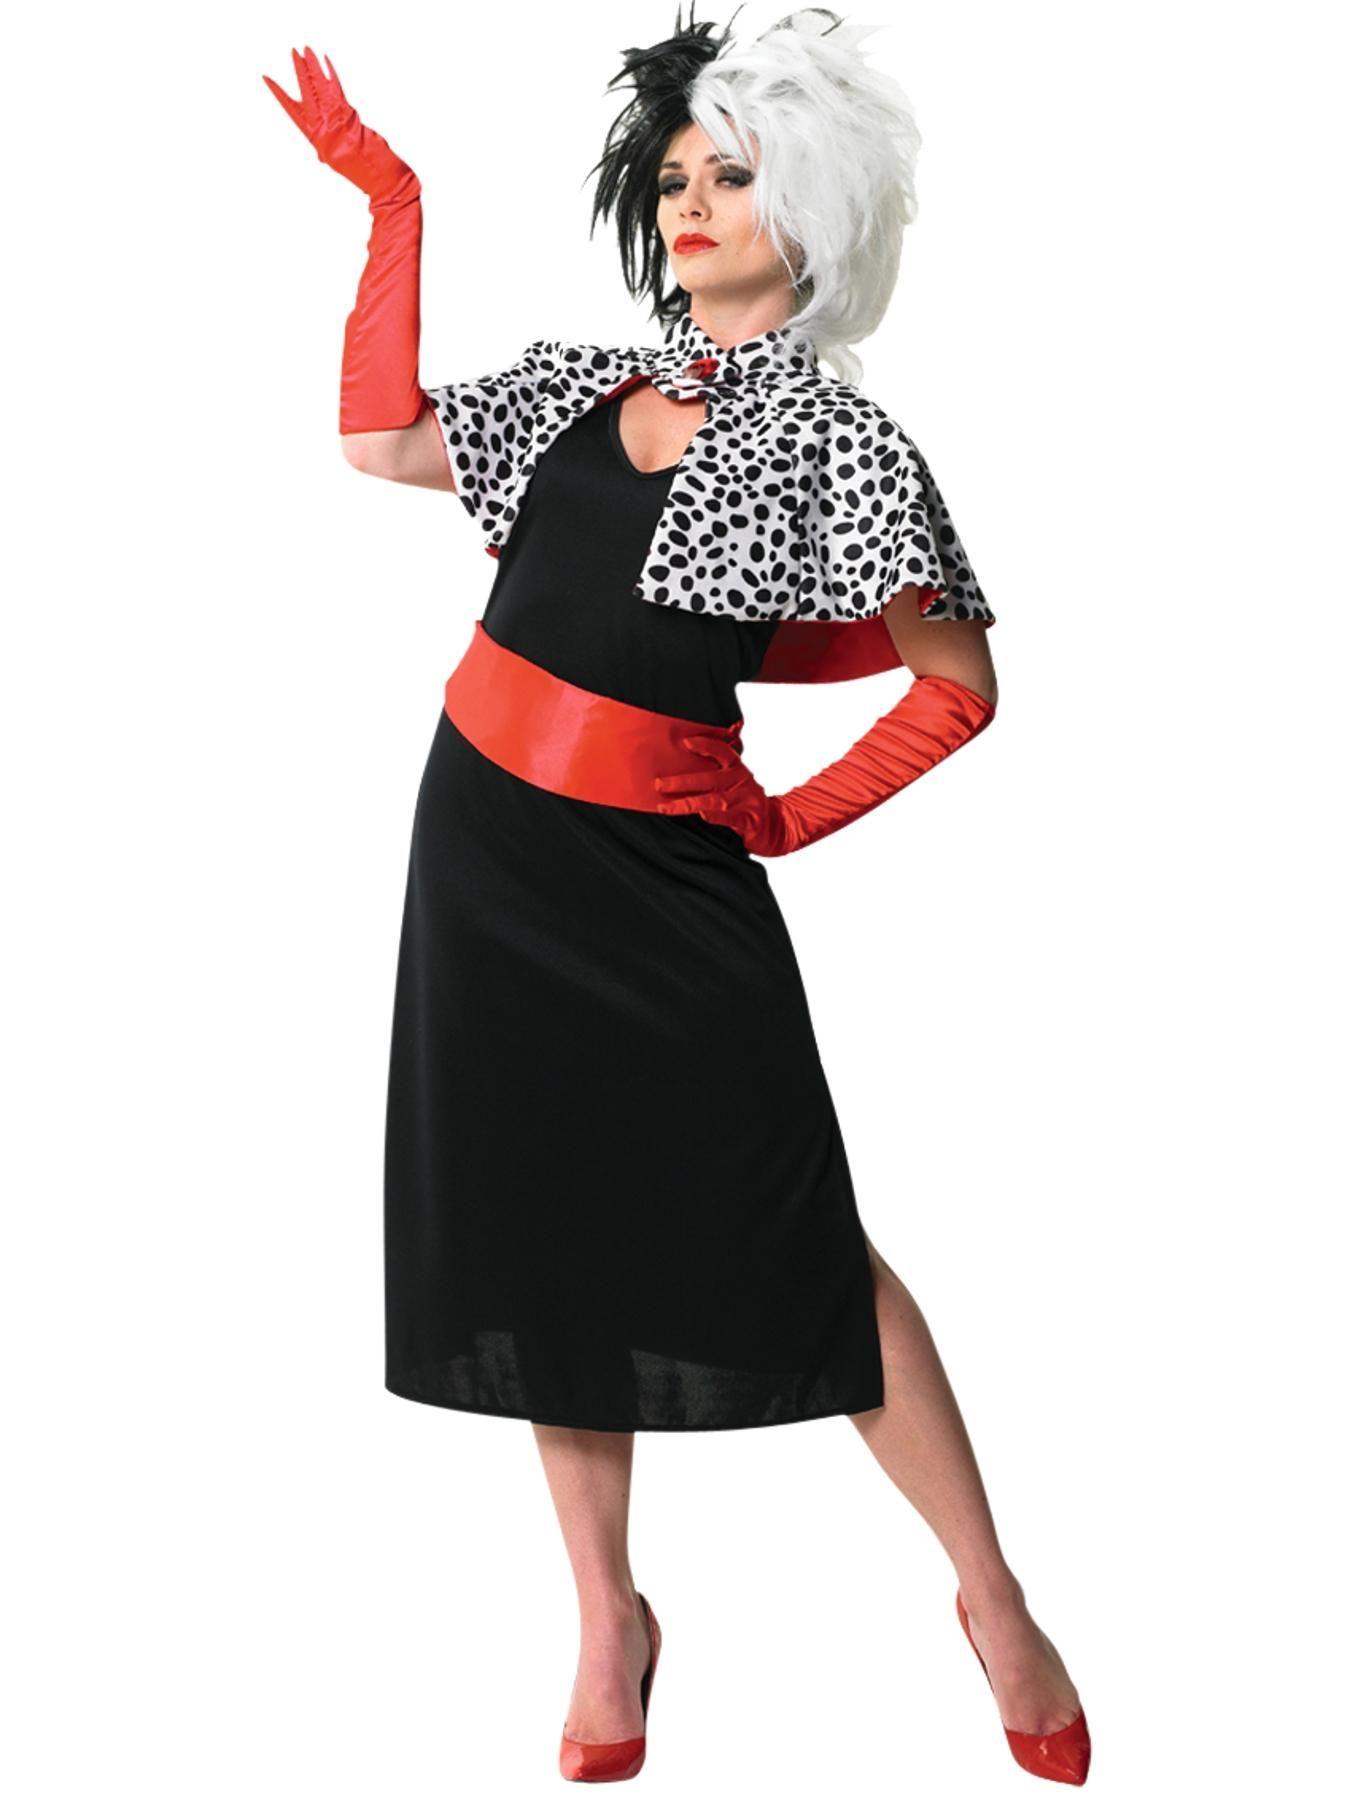 Ladies Red Cruella De Ville Costume 101 Dalmatians Halloween Fancy Dress